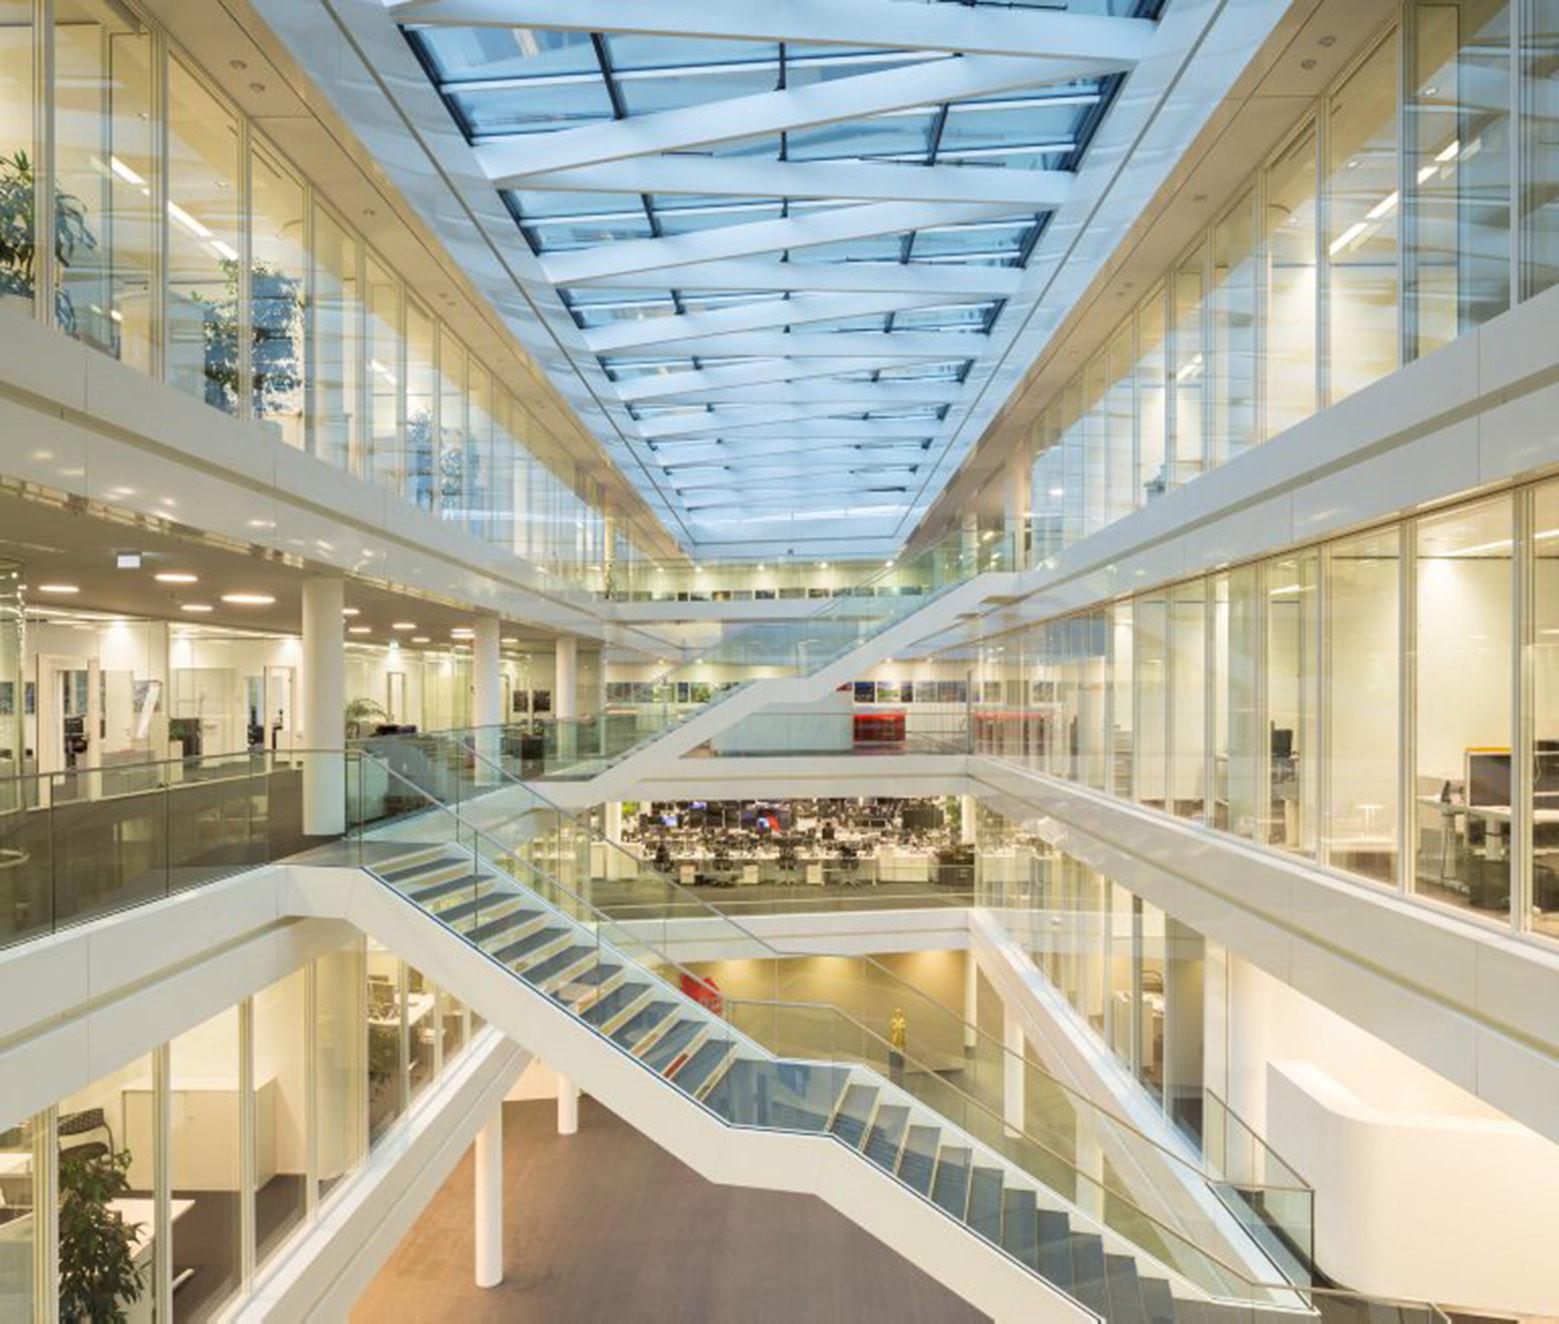 New Trianel Headquarters / gmp architekten, Courtesy of gmp architekten